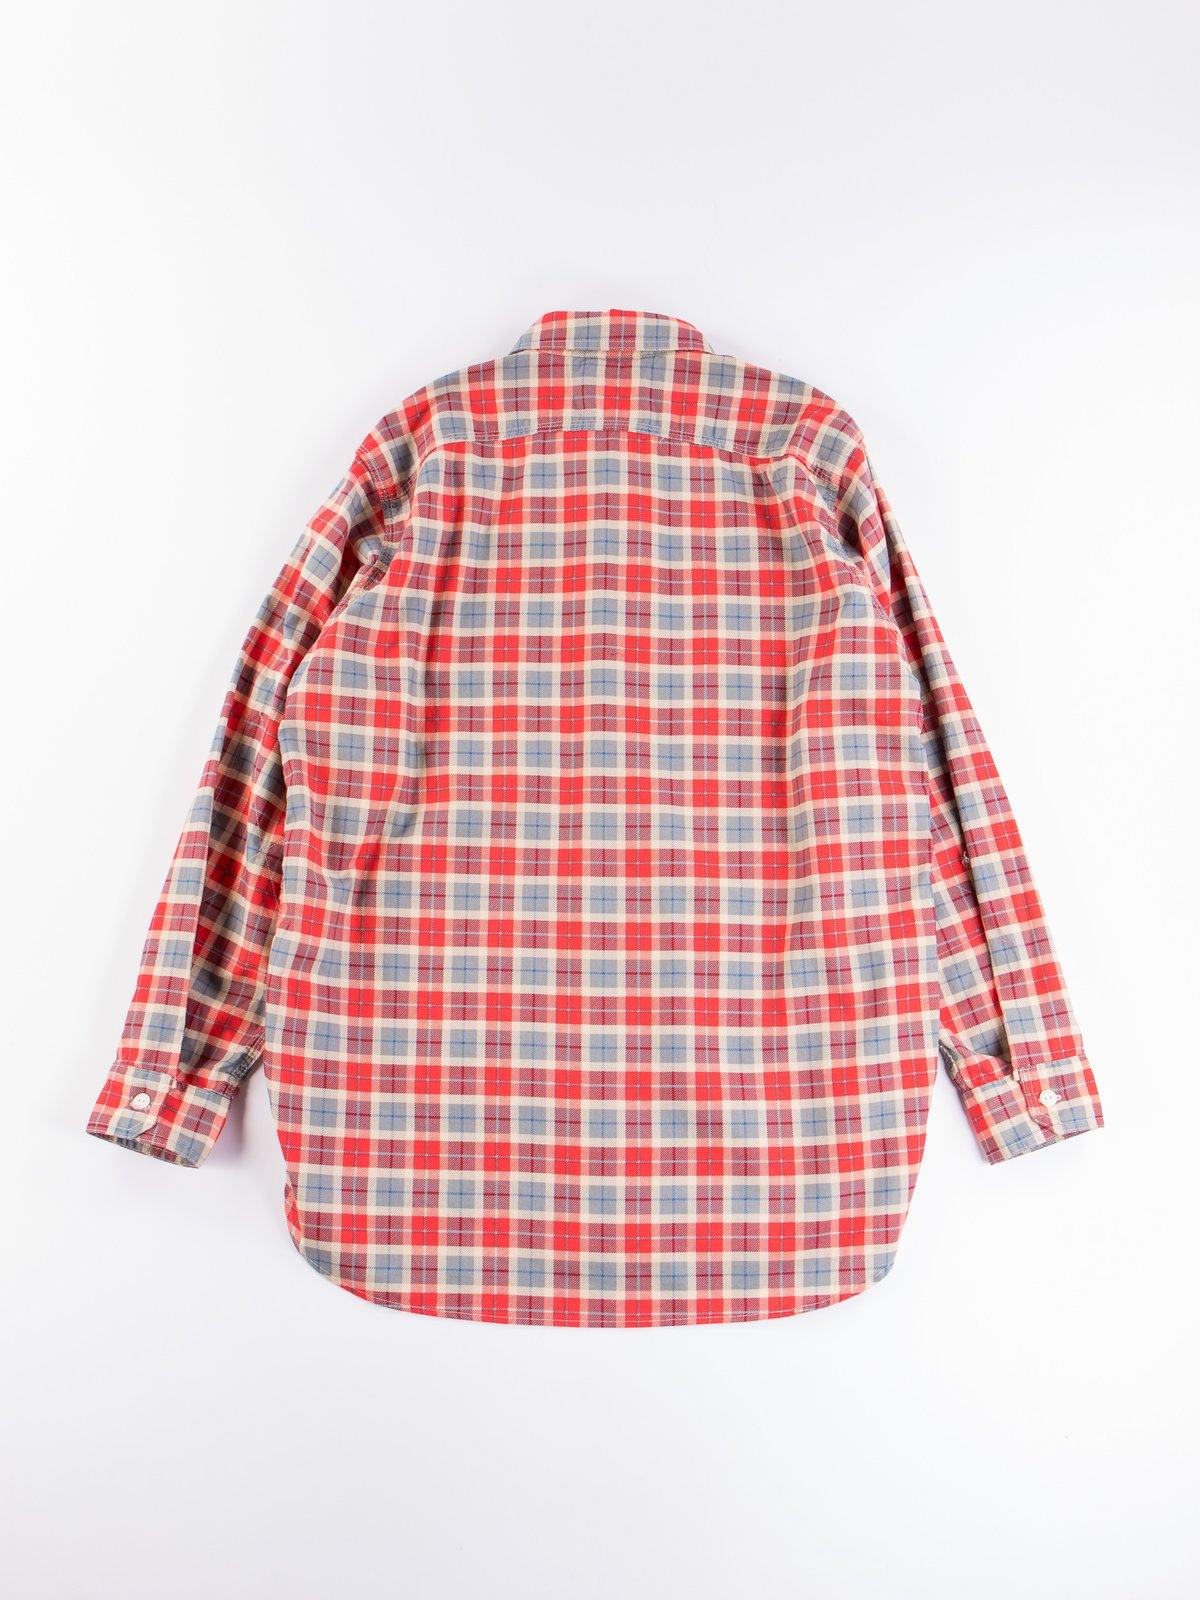 Red/Beige Cotton Printed Plaid Work Shirt - Image 6